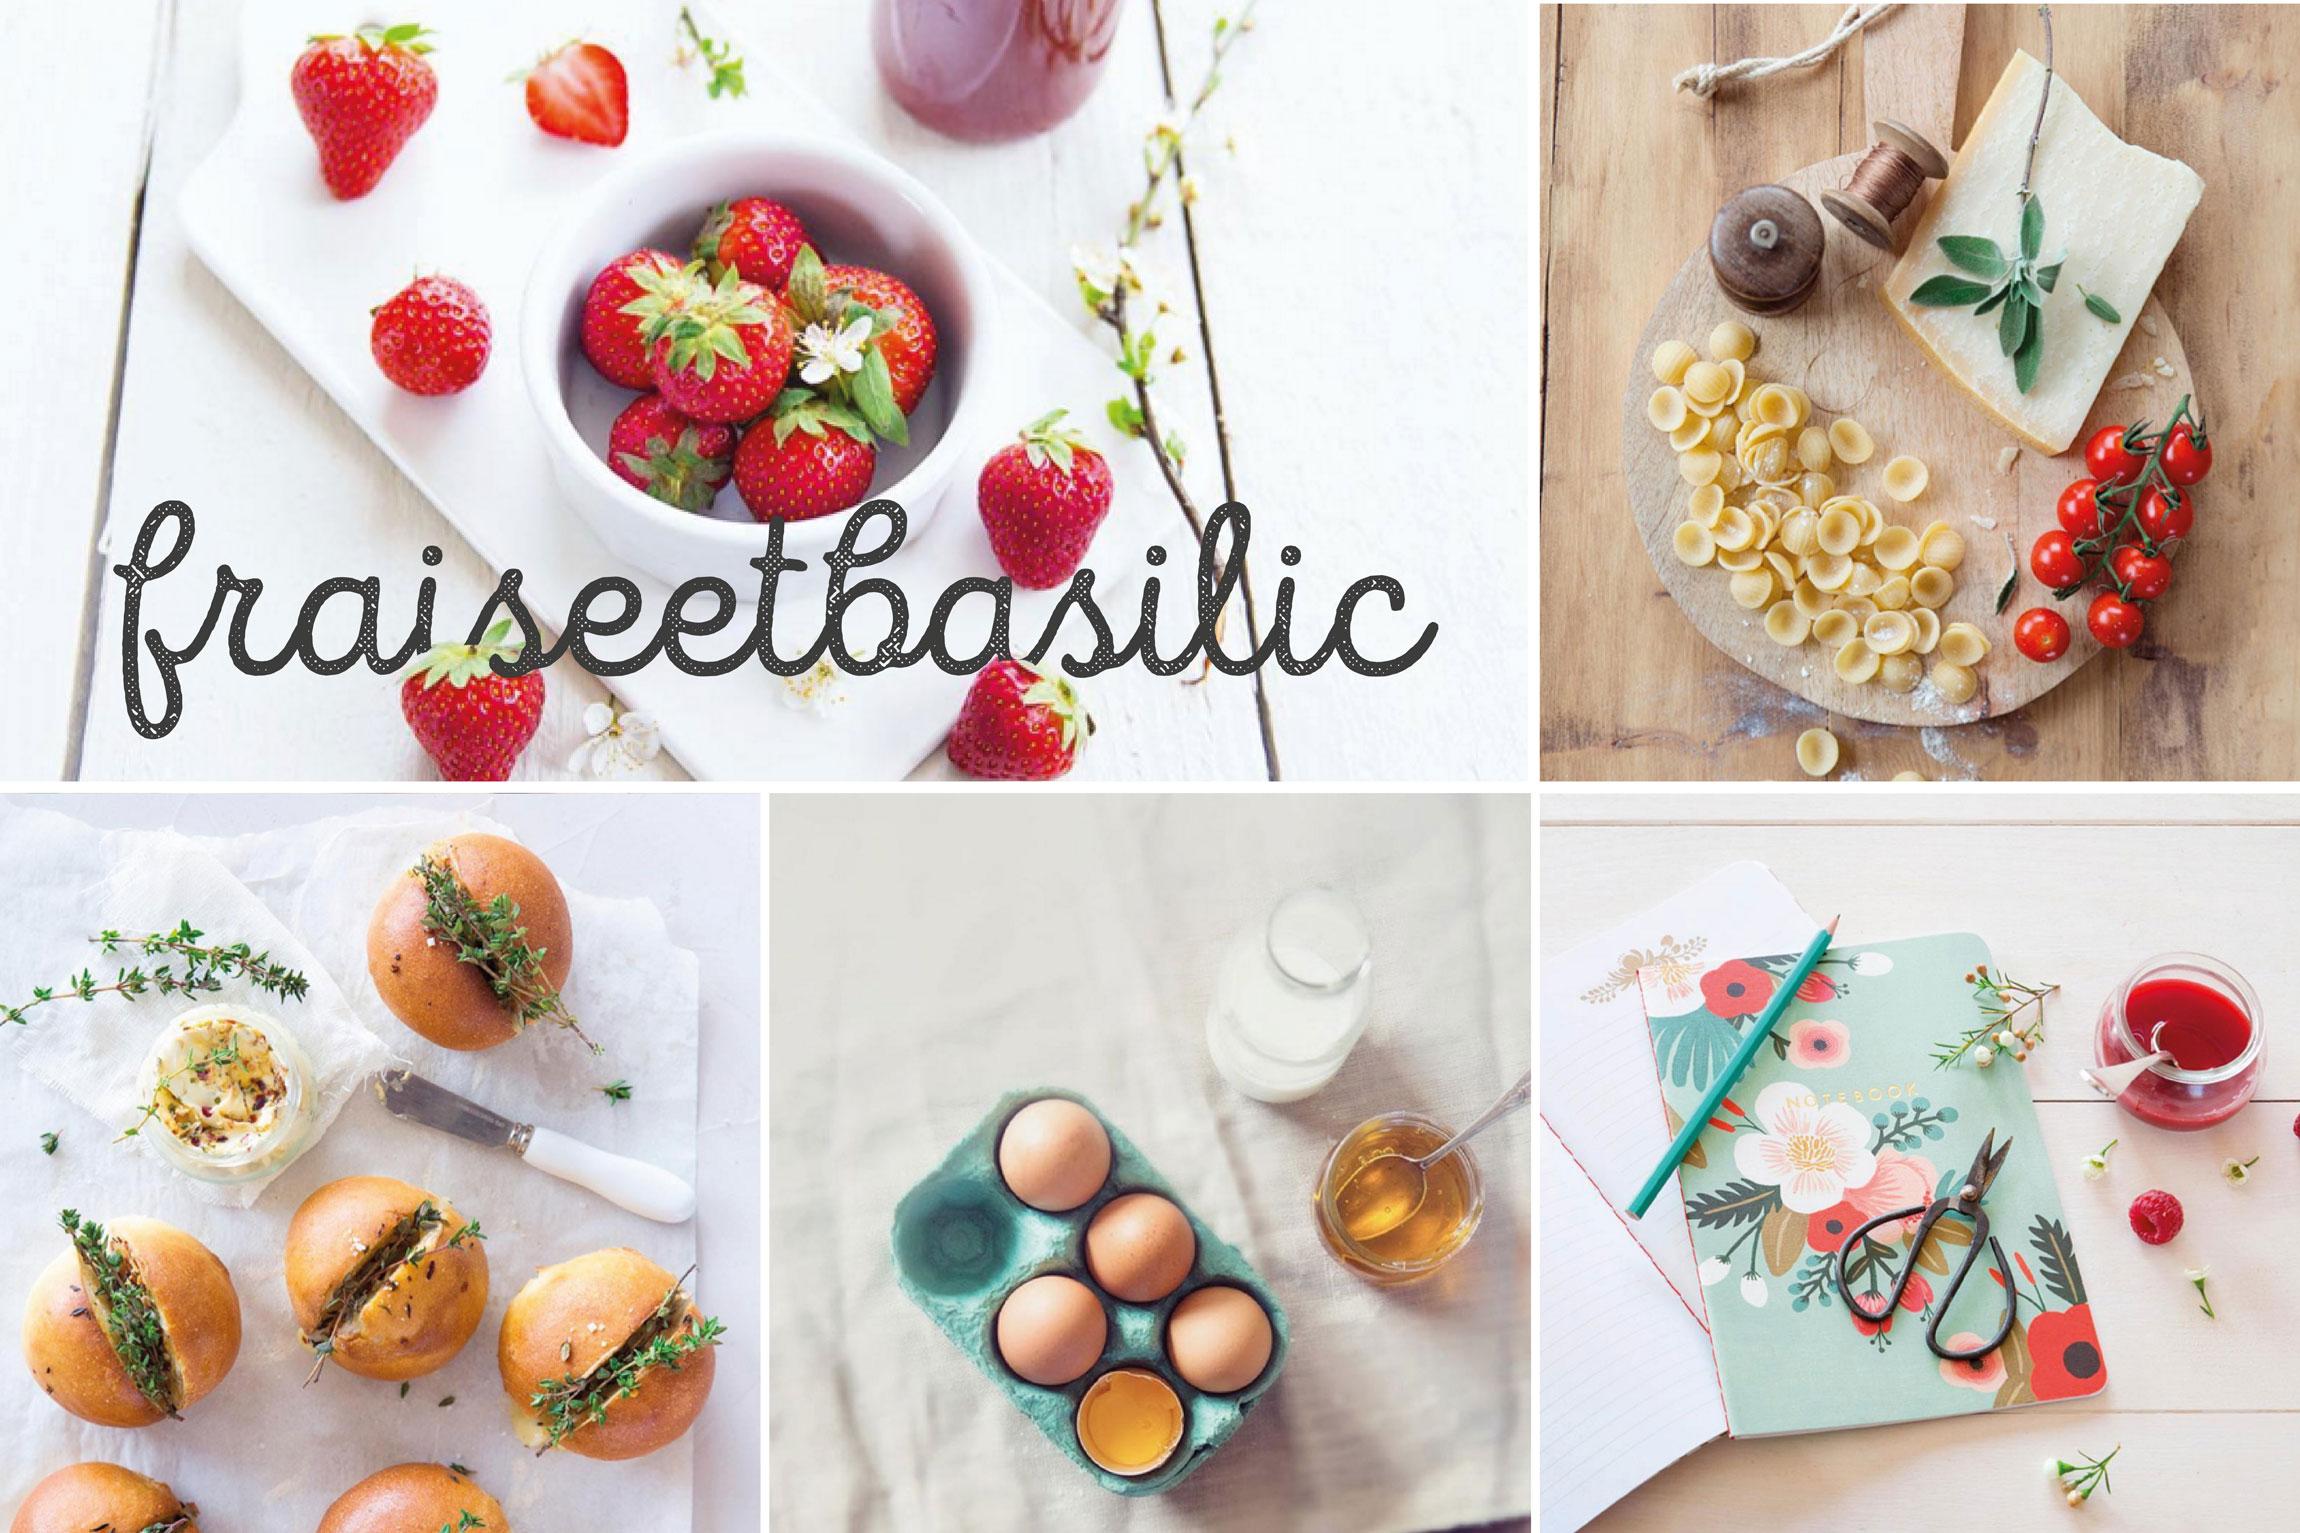 instagram-fraiseetbasilic1